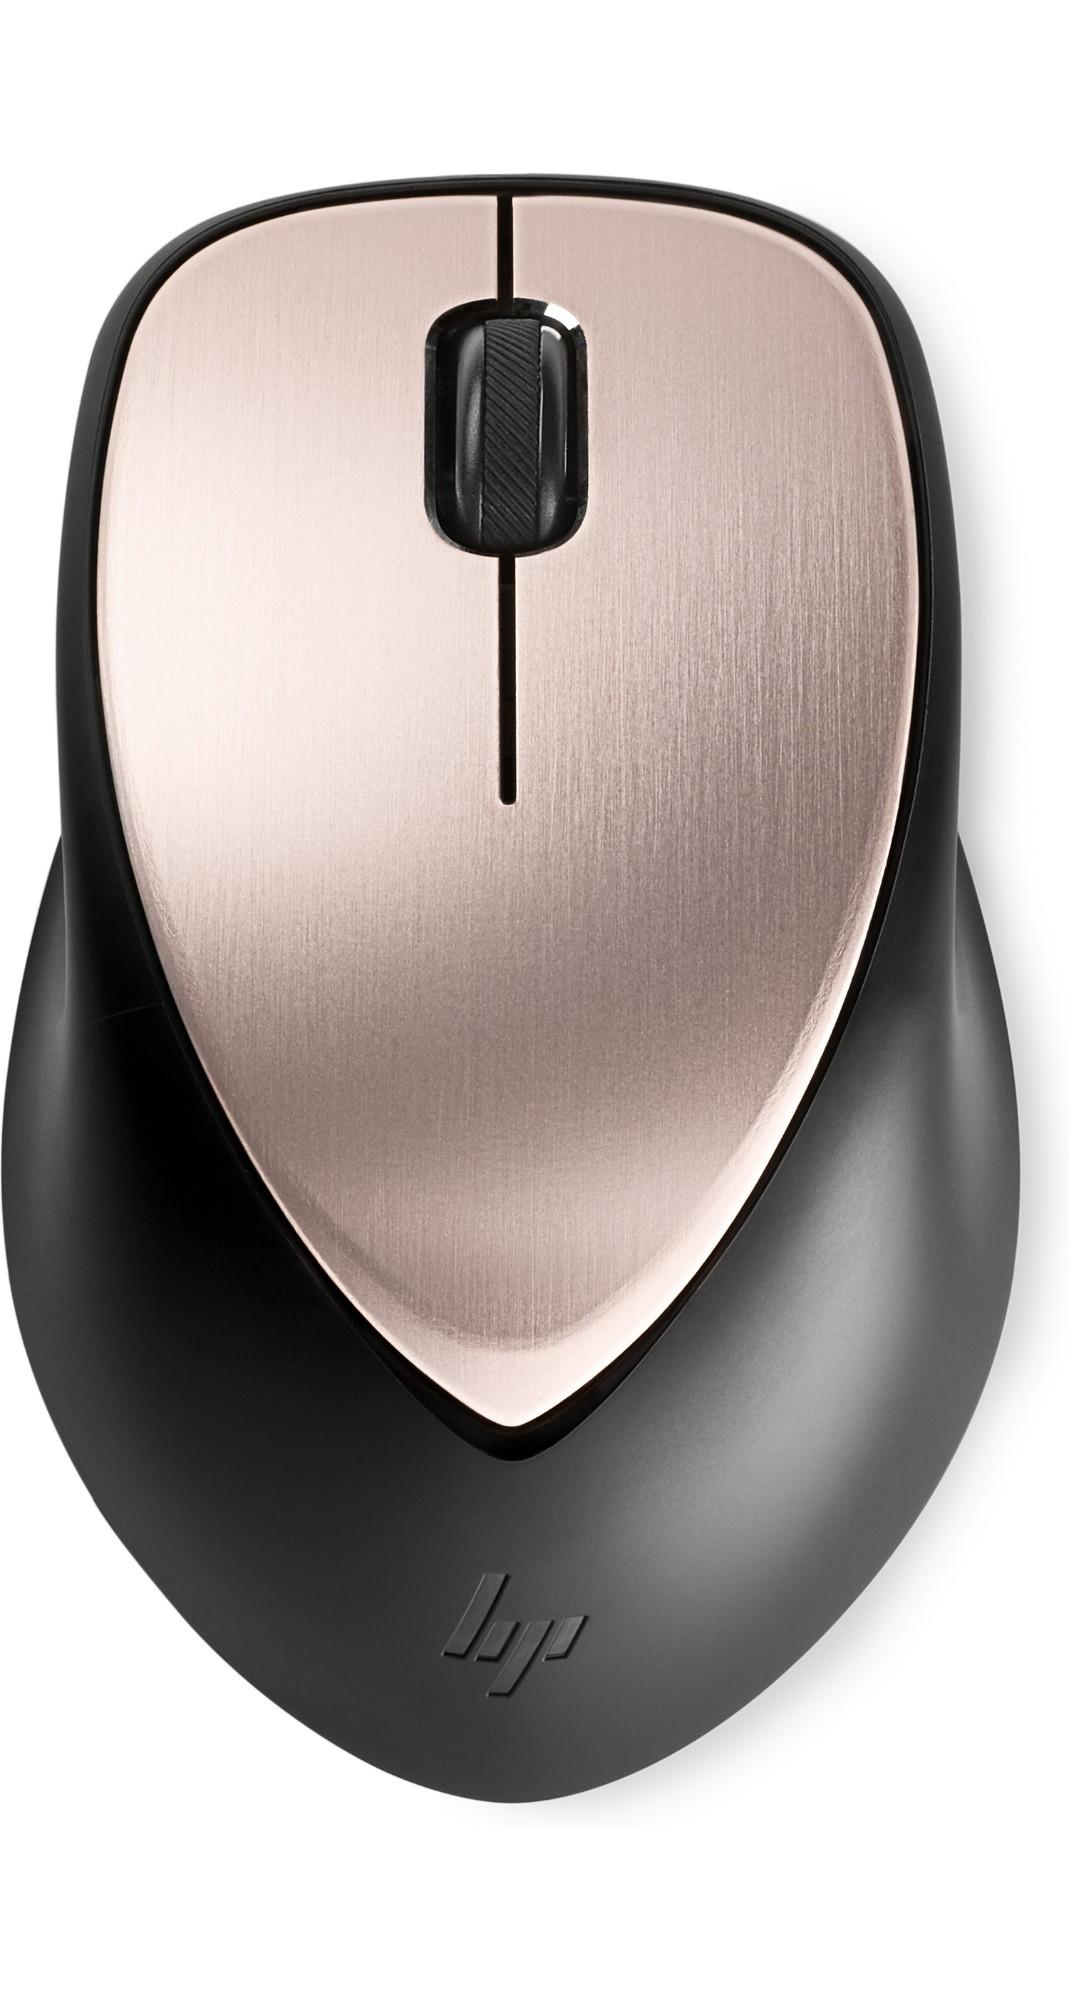 HP ENVY Rechargeable 500 mice RF Wireless Laser 1600 DPI Ambidextrous